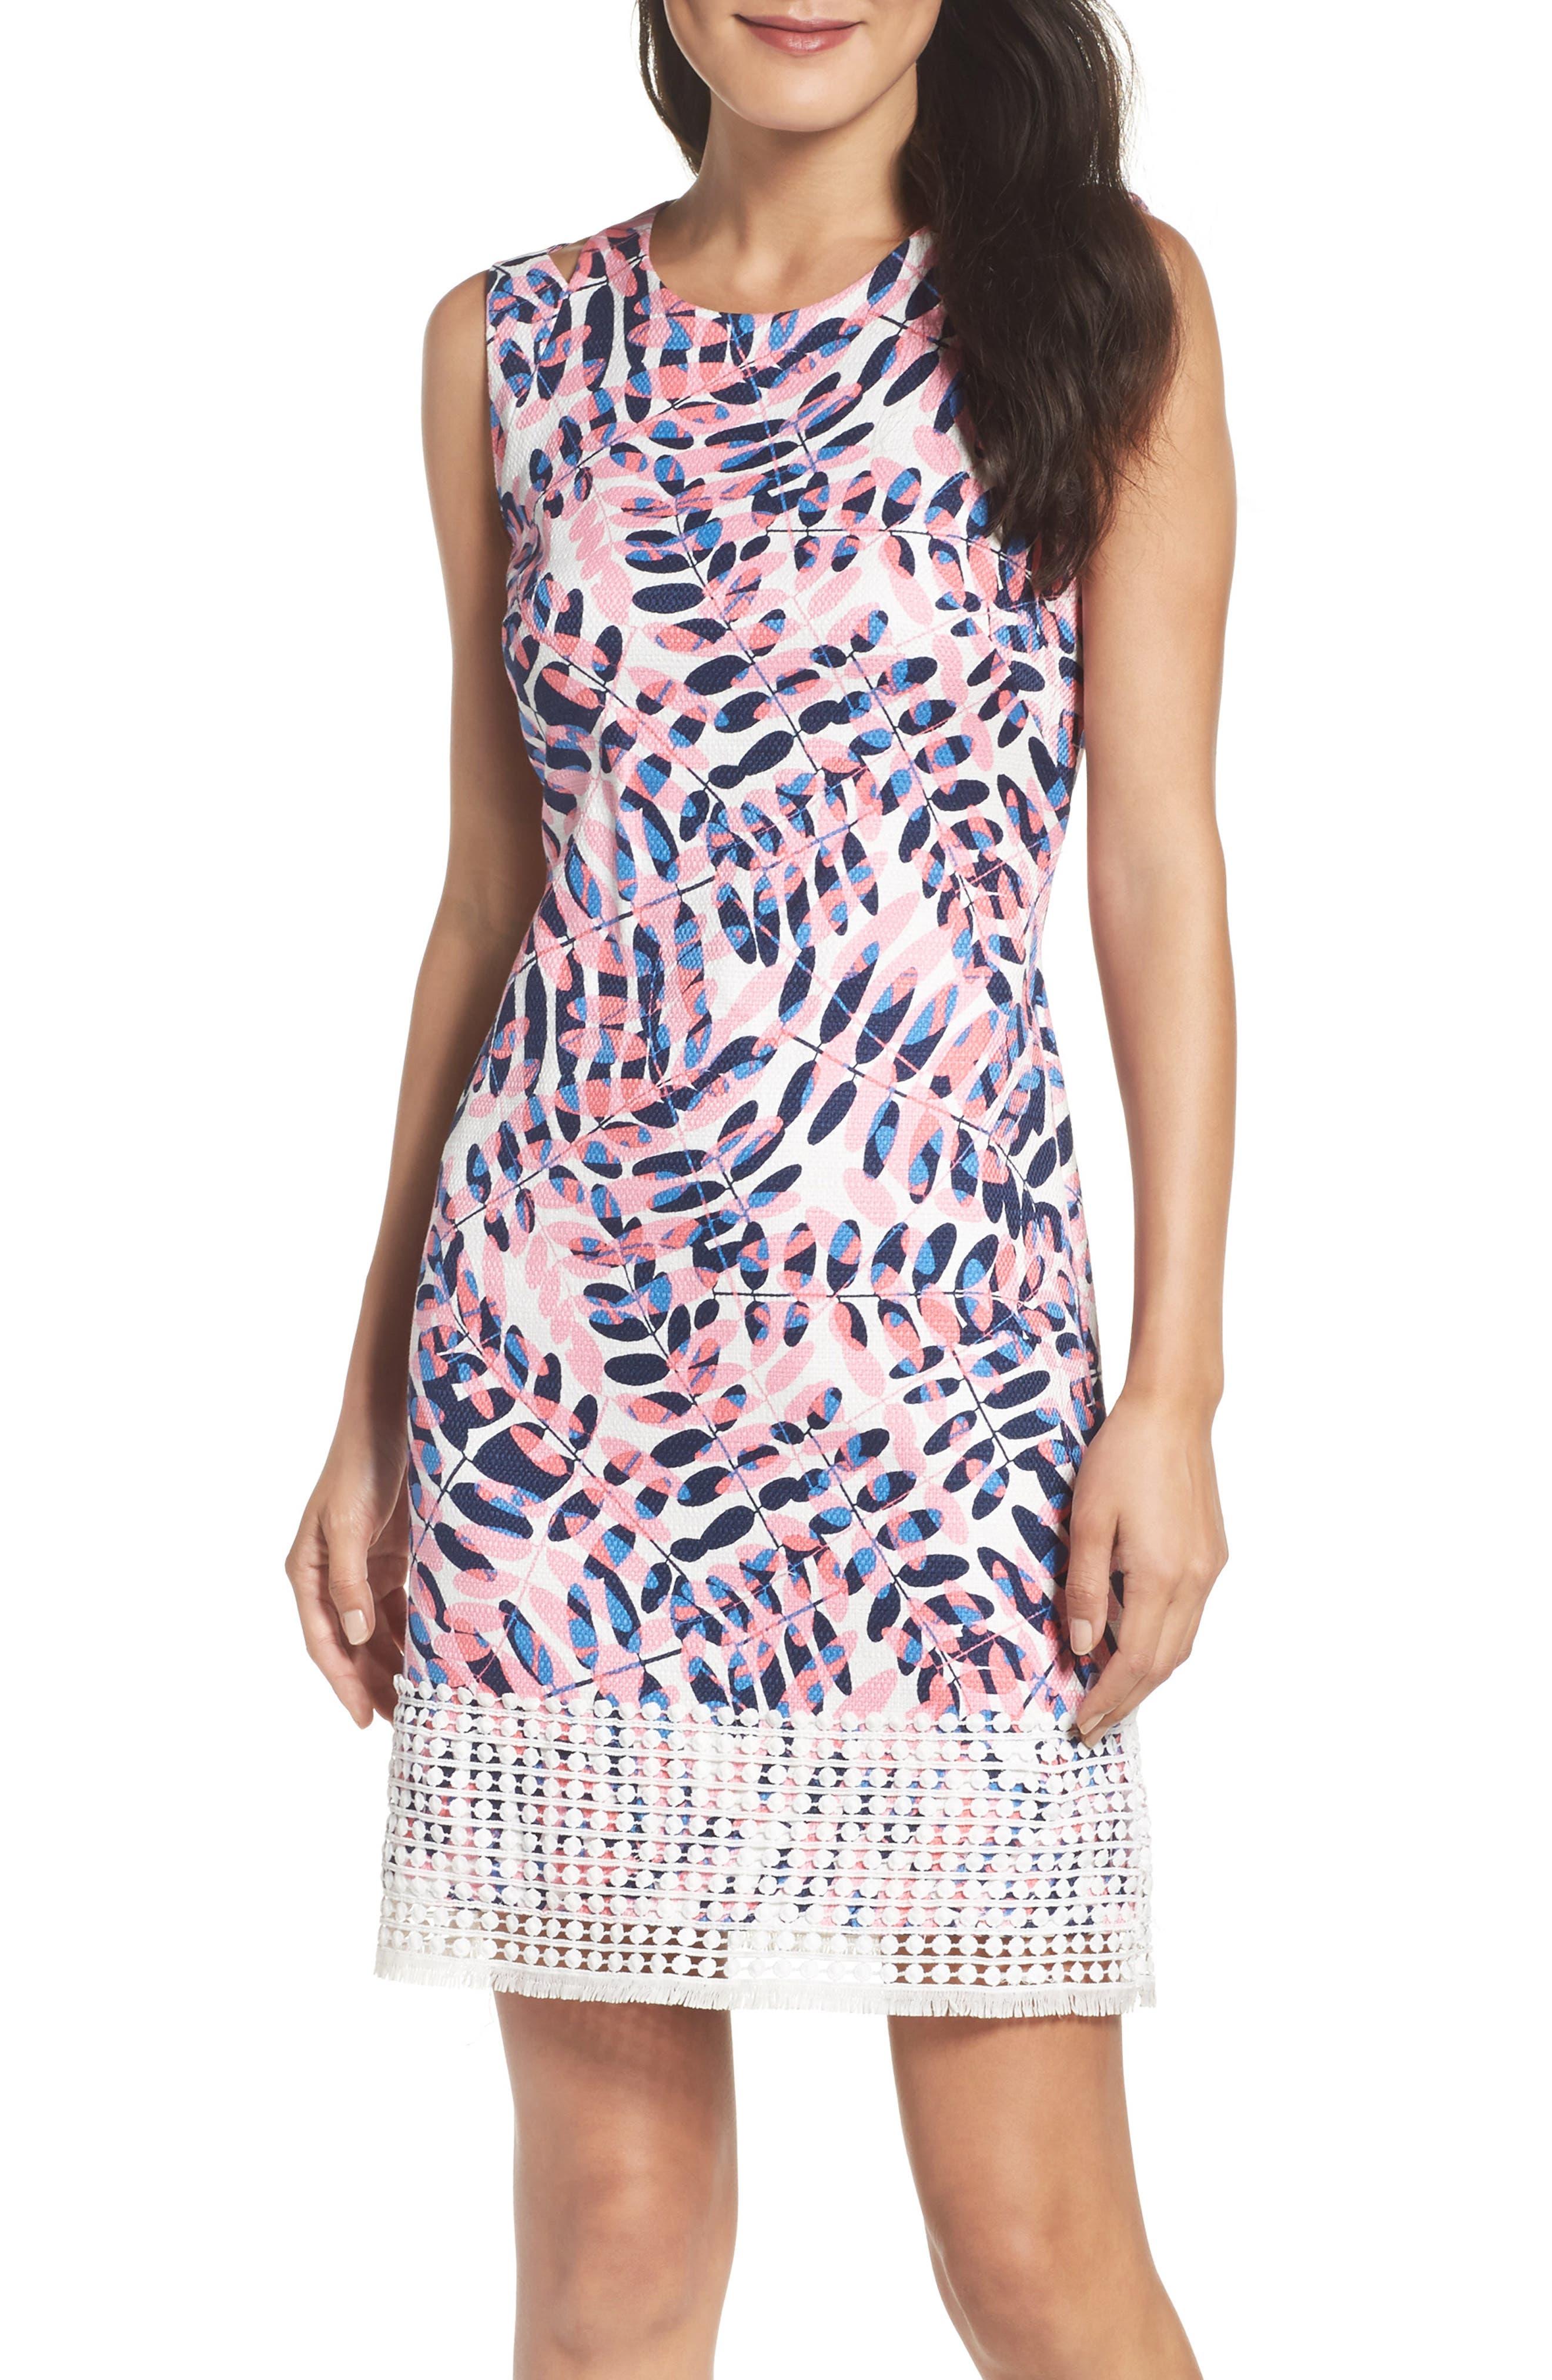 Alternate Image 1 Selected - Taylor Dresses Print Sheath Dress